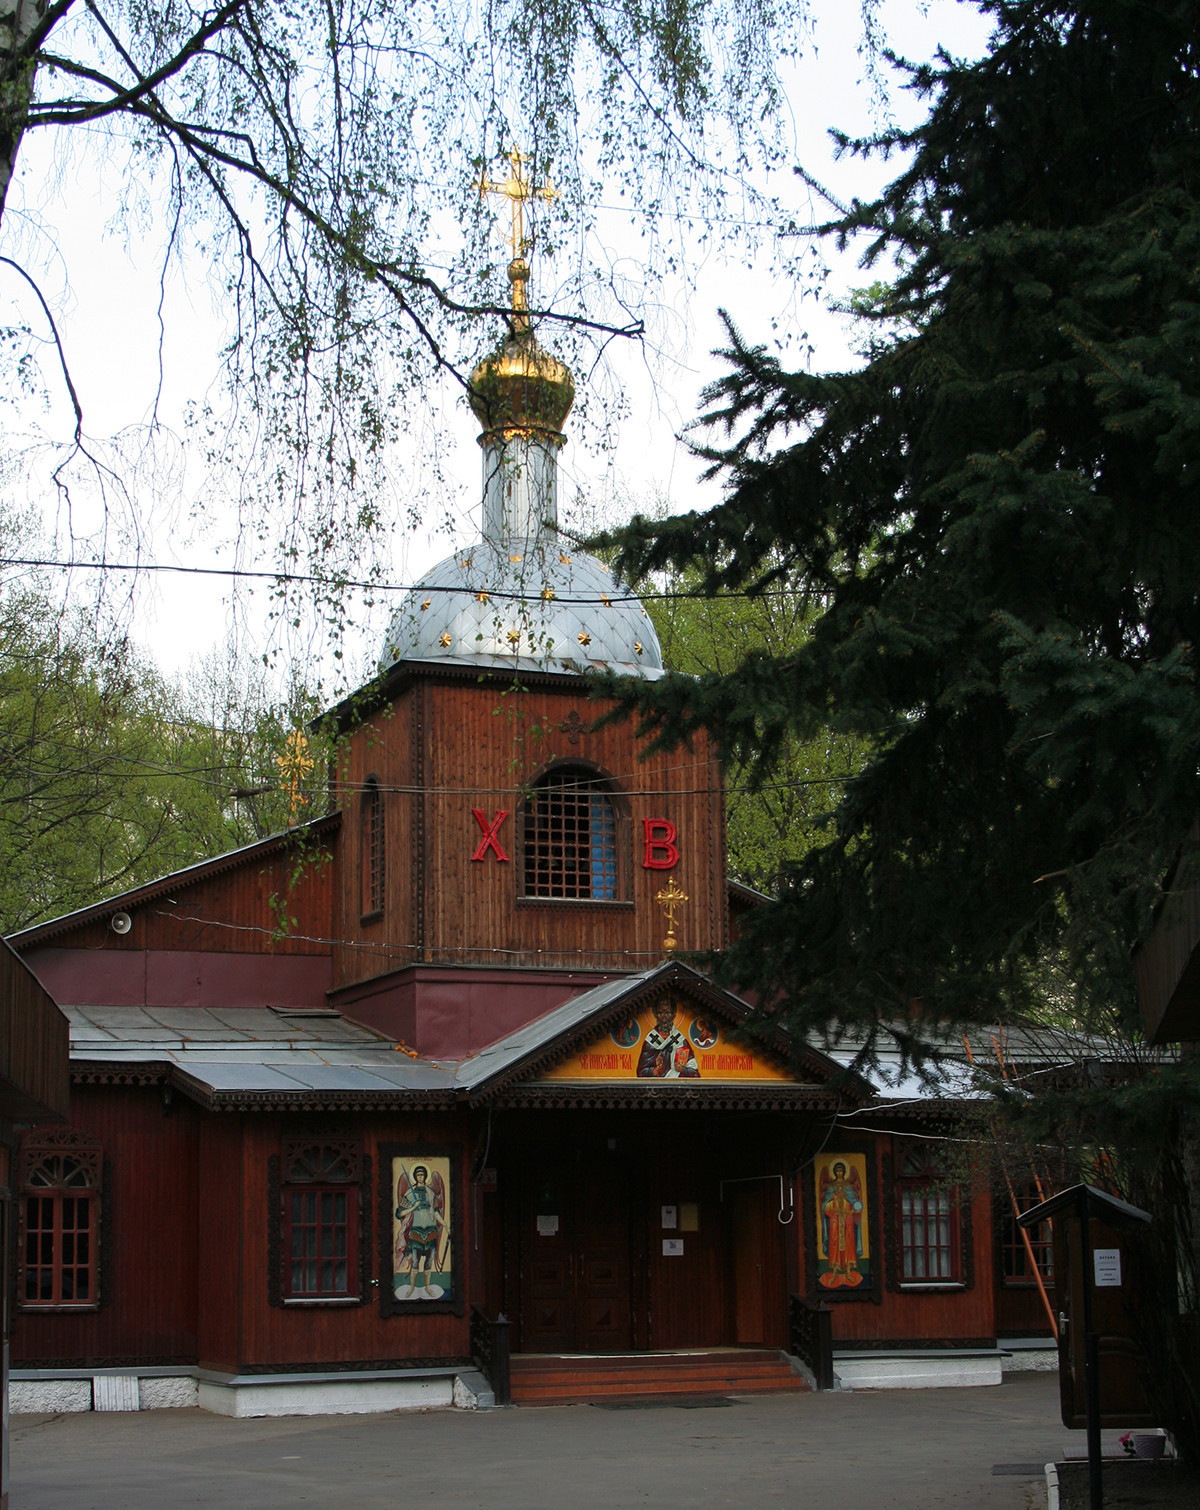 Kirche St. Nikolaus in Birjuljowo, Moskau erbaut 1956